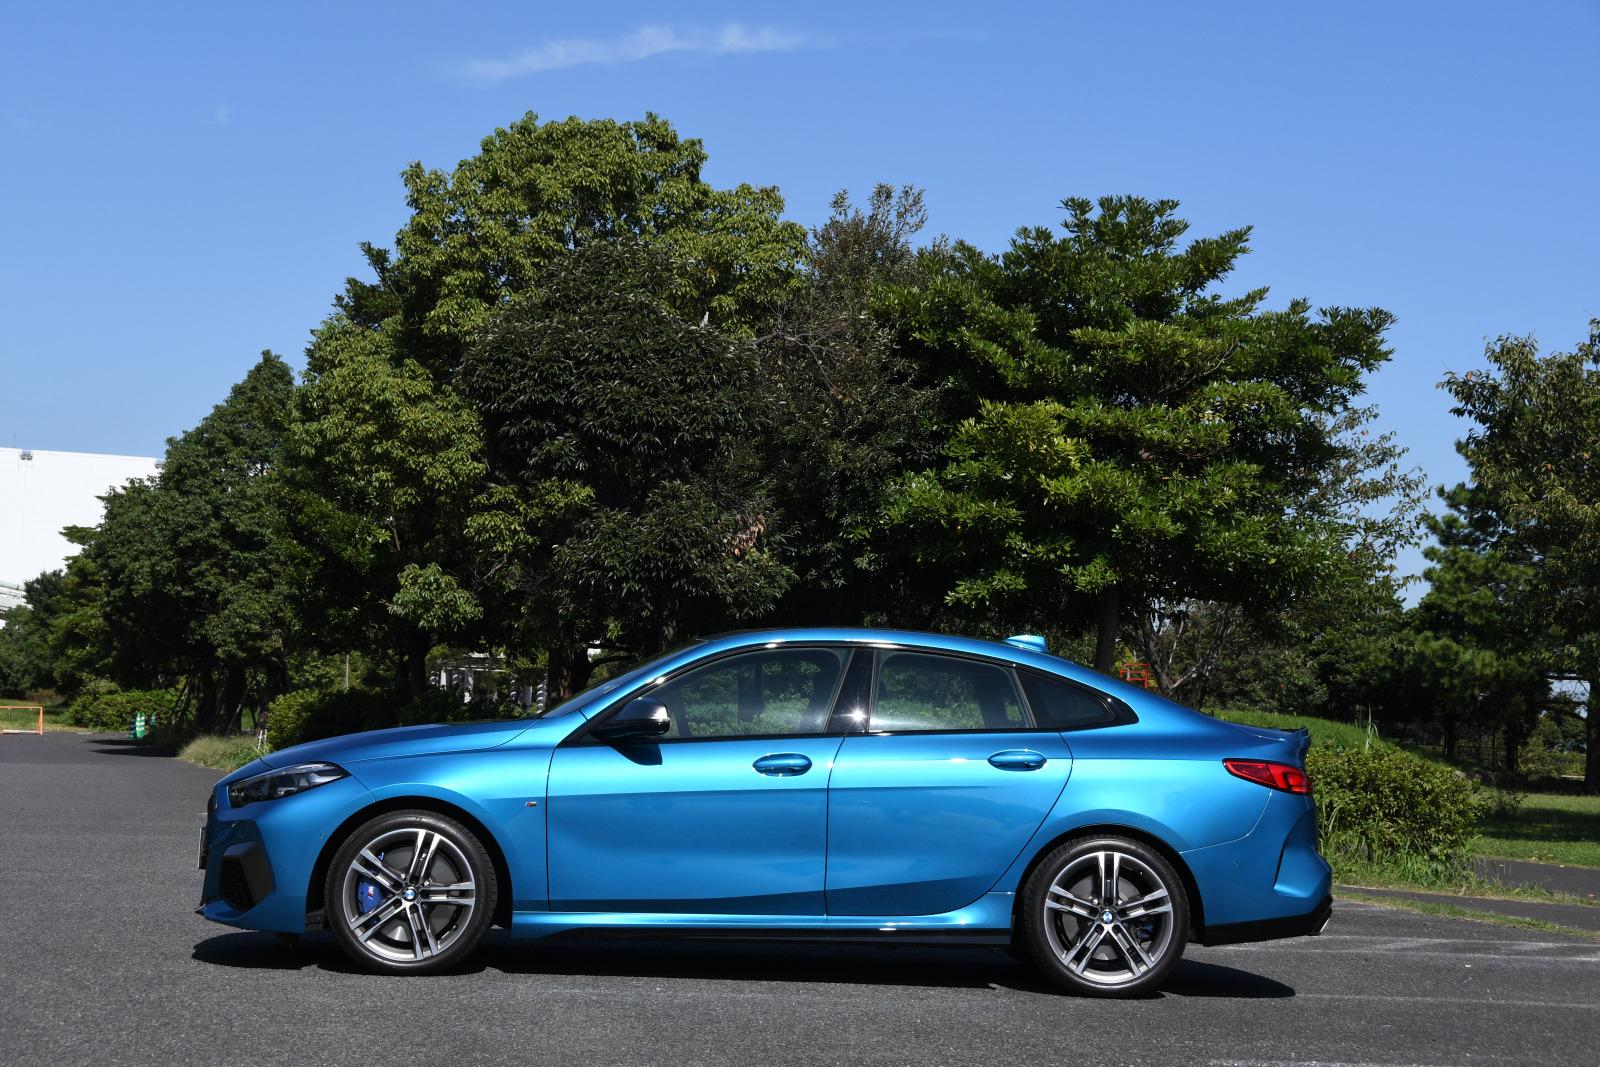 「FFベース4WDの味付けに開眼したBMW 【BMW M235i Xドライブ グランクーペ試乗】」の3枚目の画像